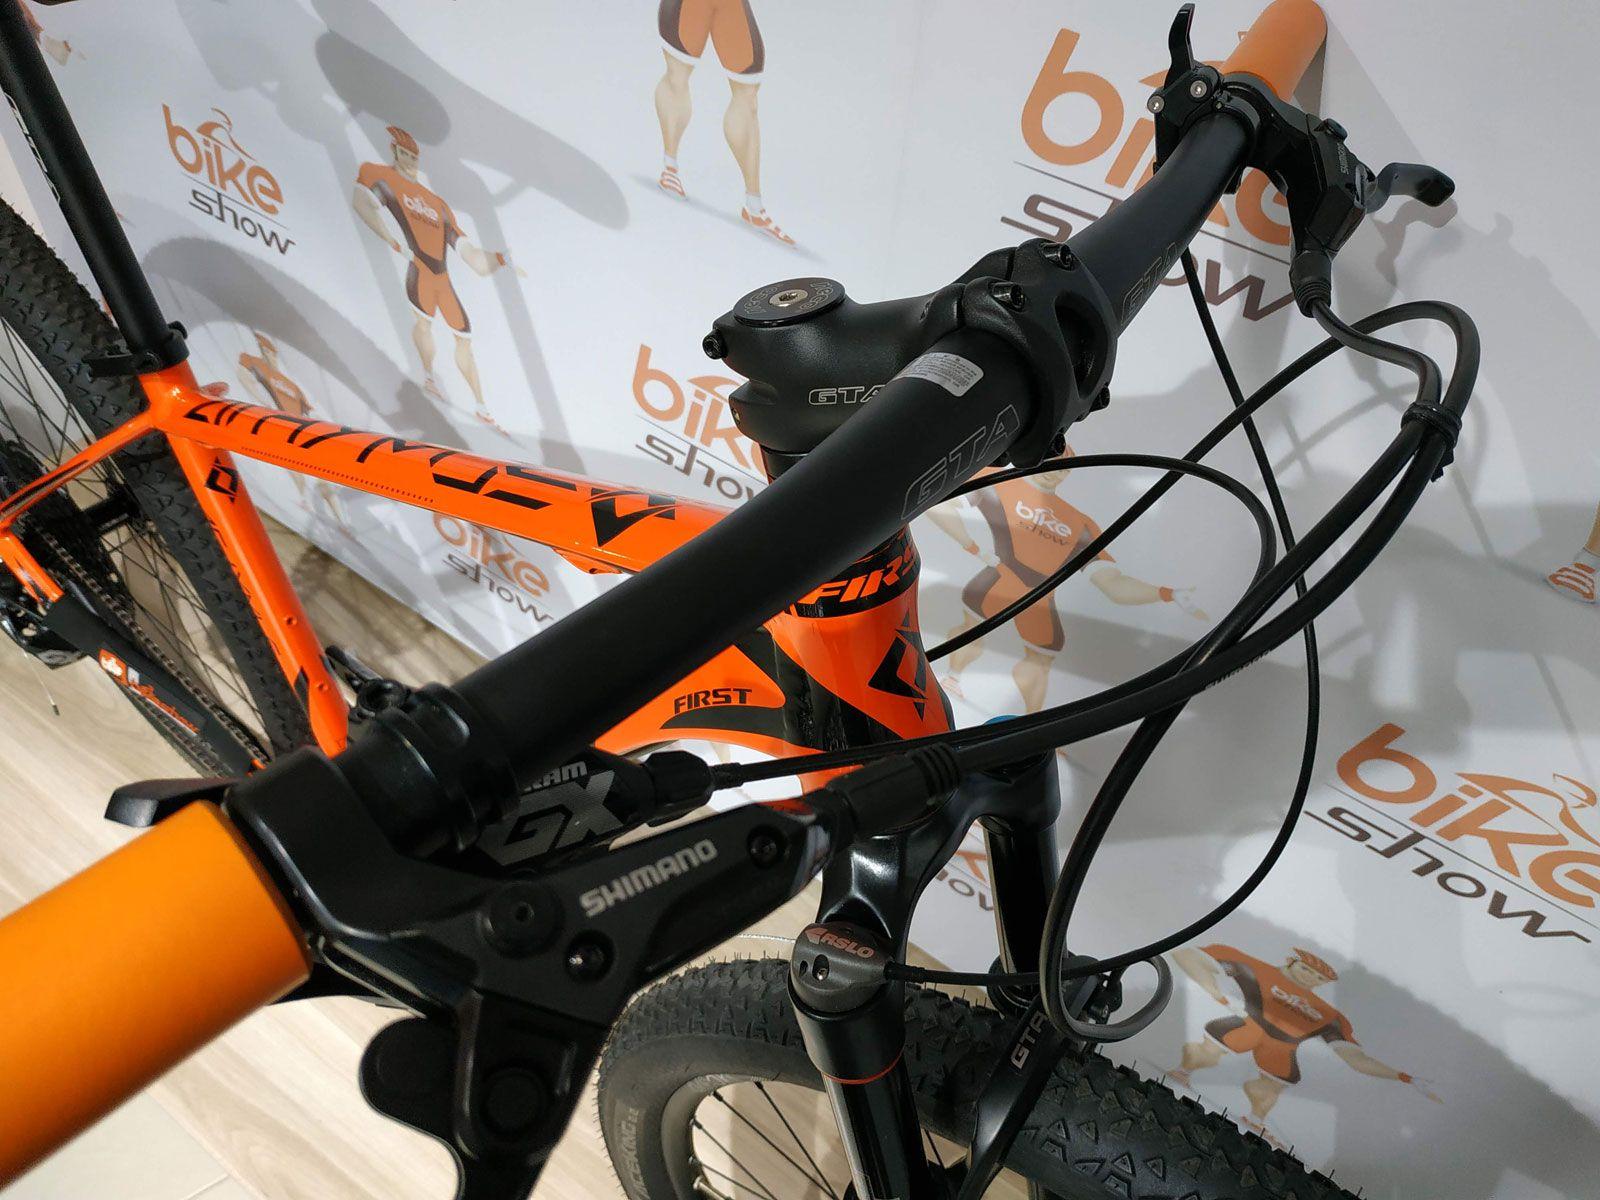 Bicicleta FIRST Athymus aro 29 - 12V Sram GX - Freio Hidráulico - Roda Session